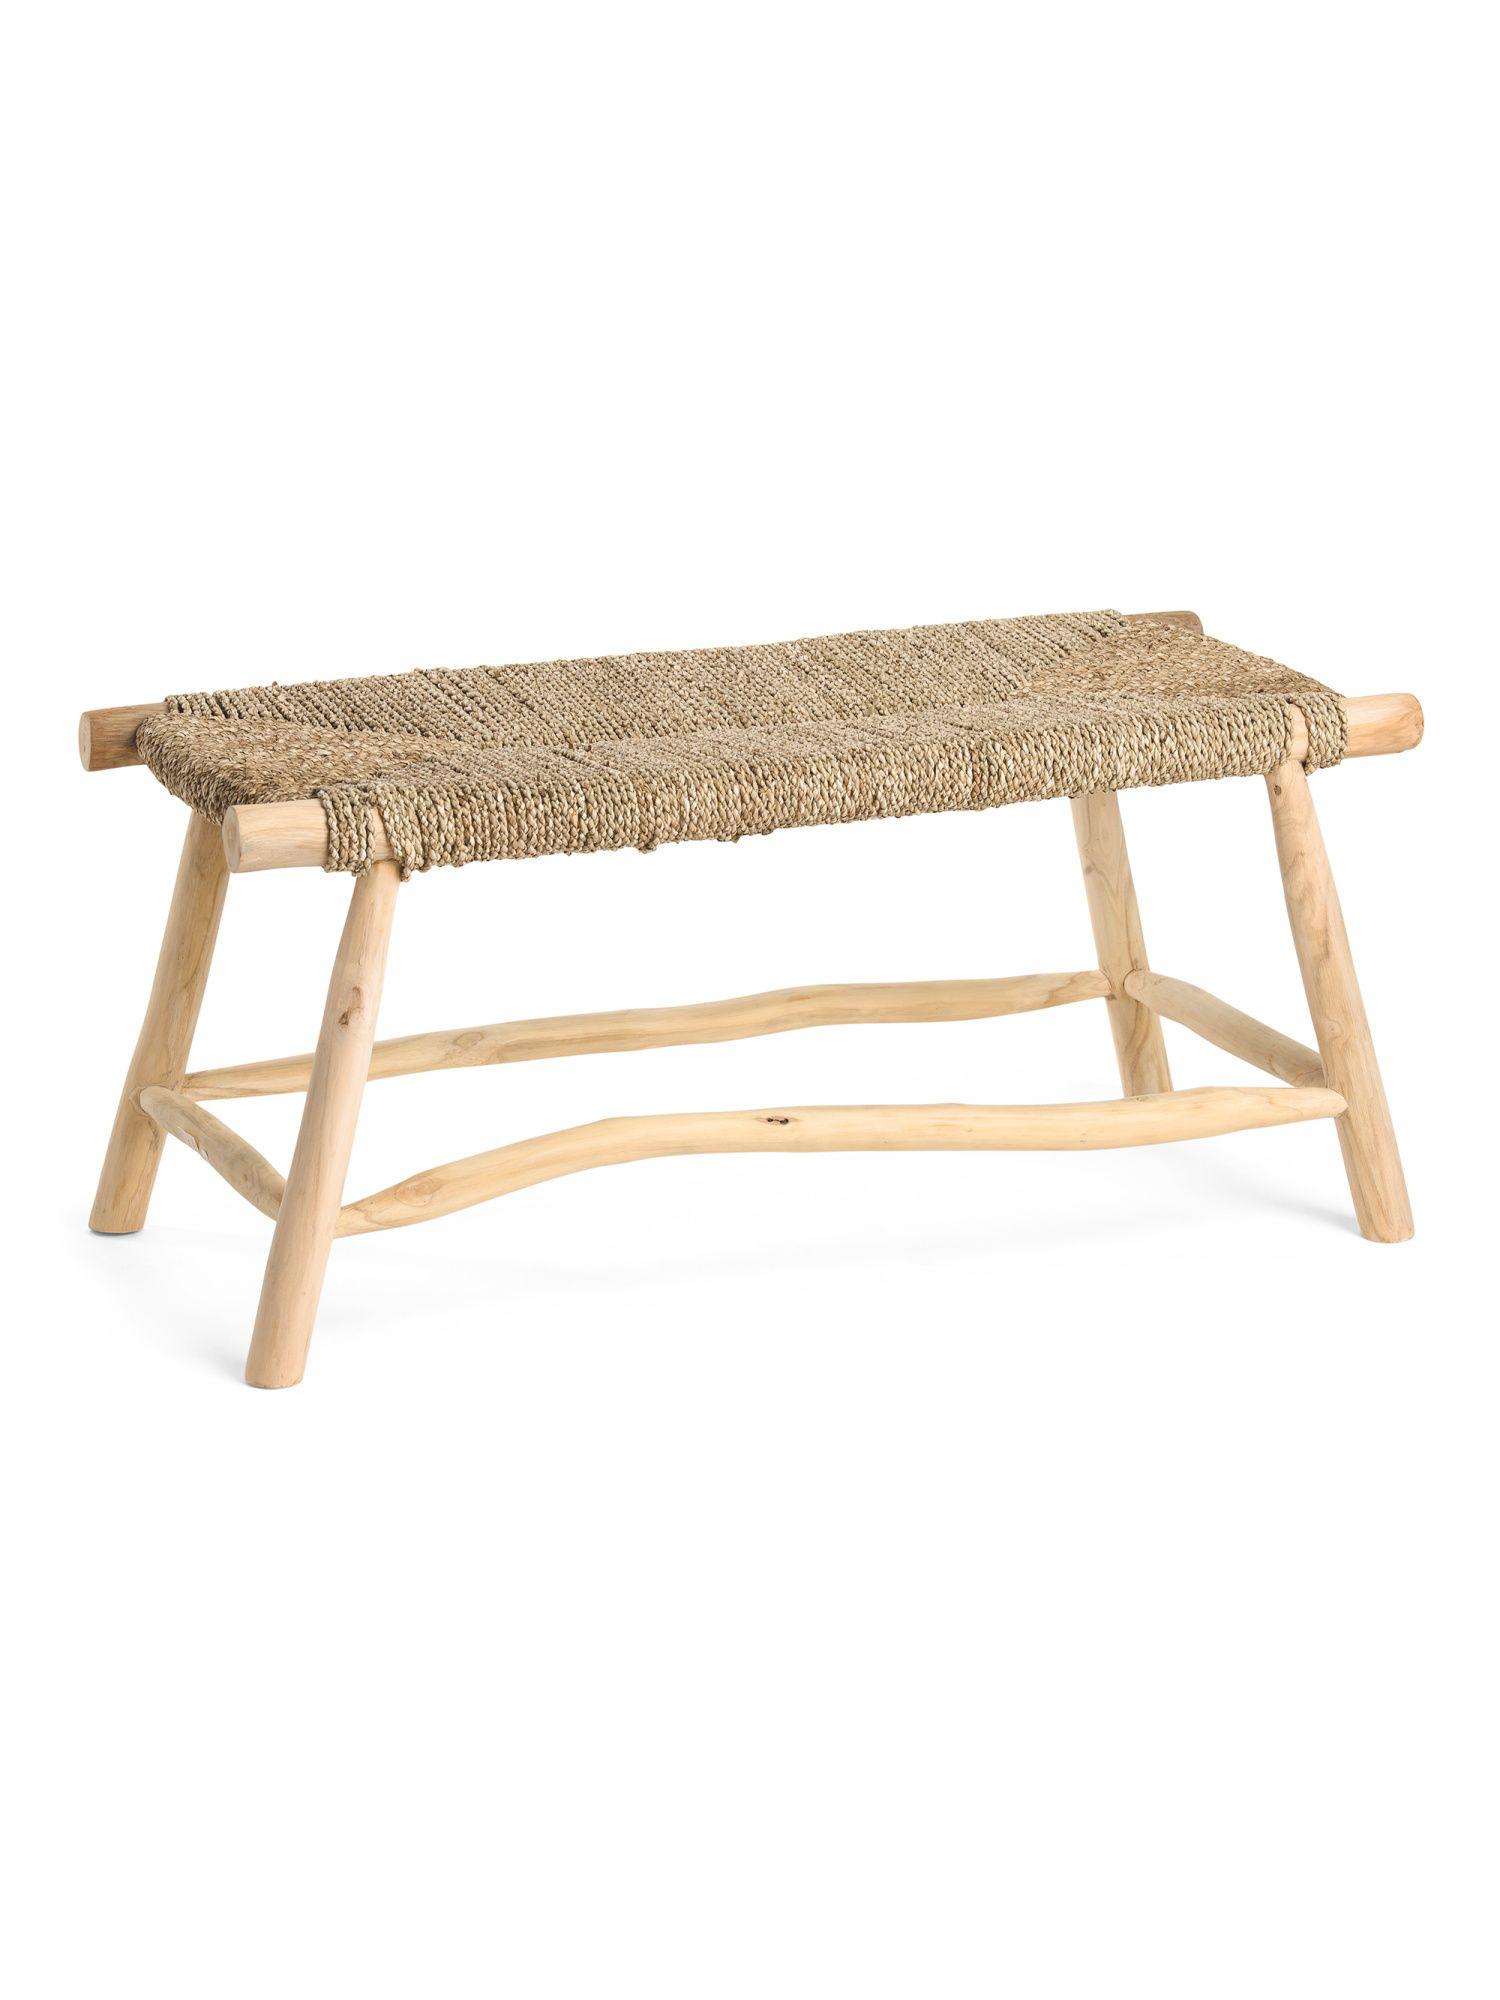 Waverly Seagrass Bench With Teak Legs In 2021 Seagrass Bench Bench Teak [ 2000 x 1500 Pixel ]